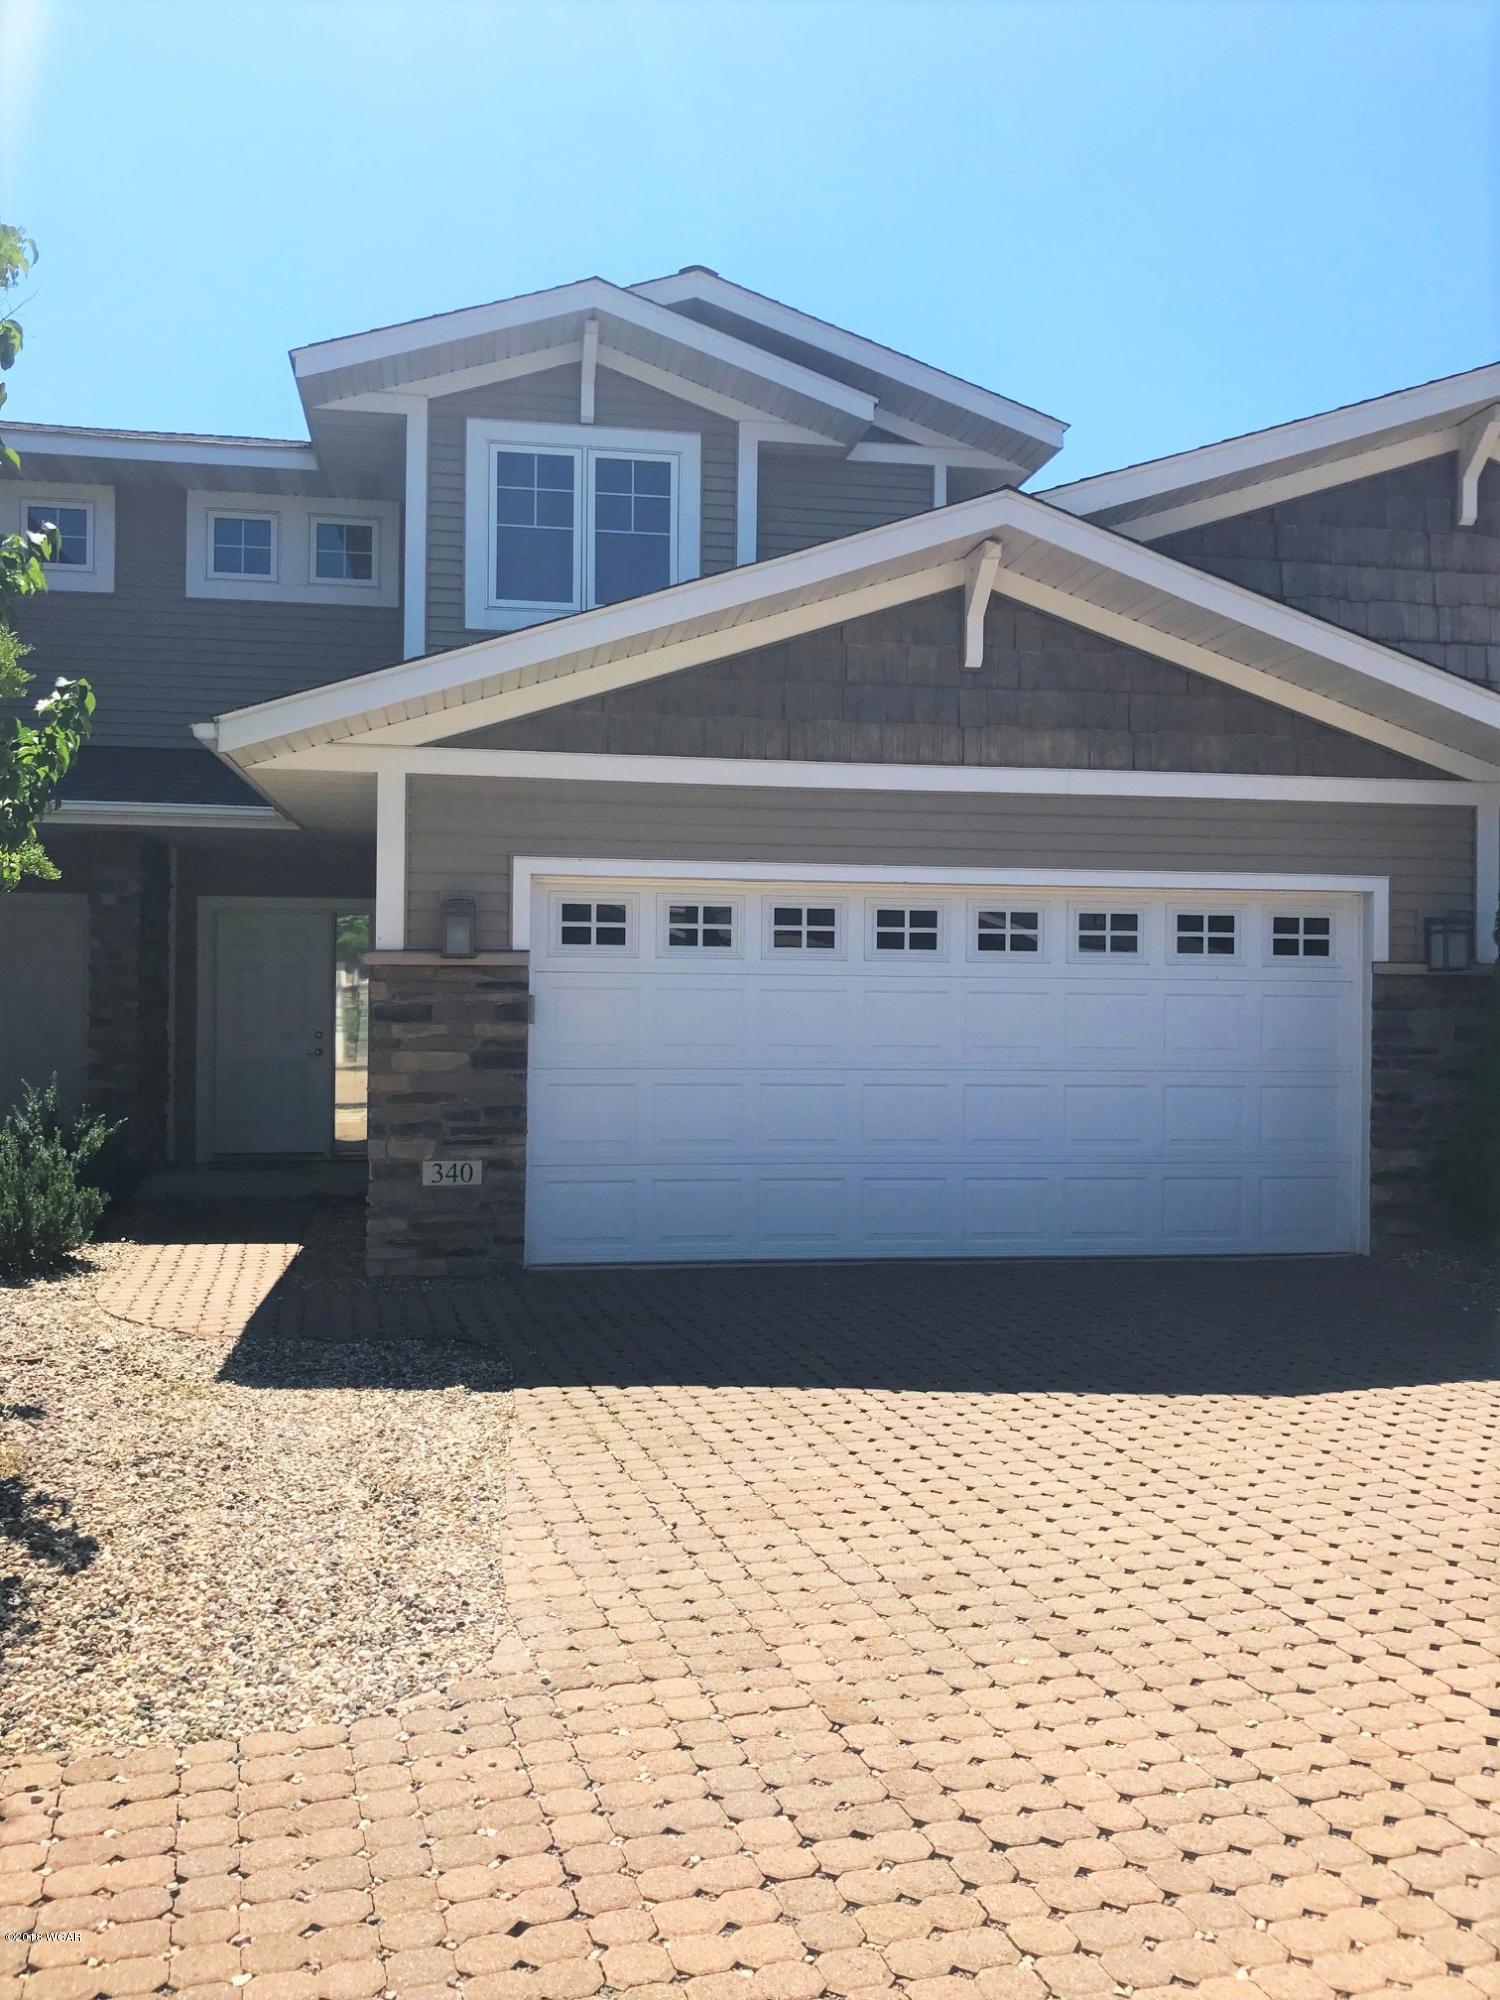 340 Martinson Boulevard,Spicer,3 Bedrooms Bedrooms,3 BathroomsBathrooms,Single Family,Martinson Boulevard,6031648